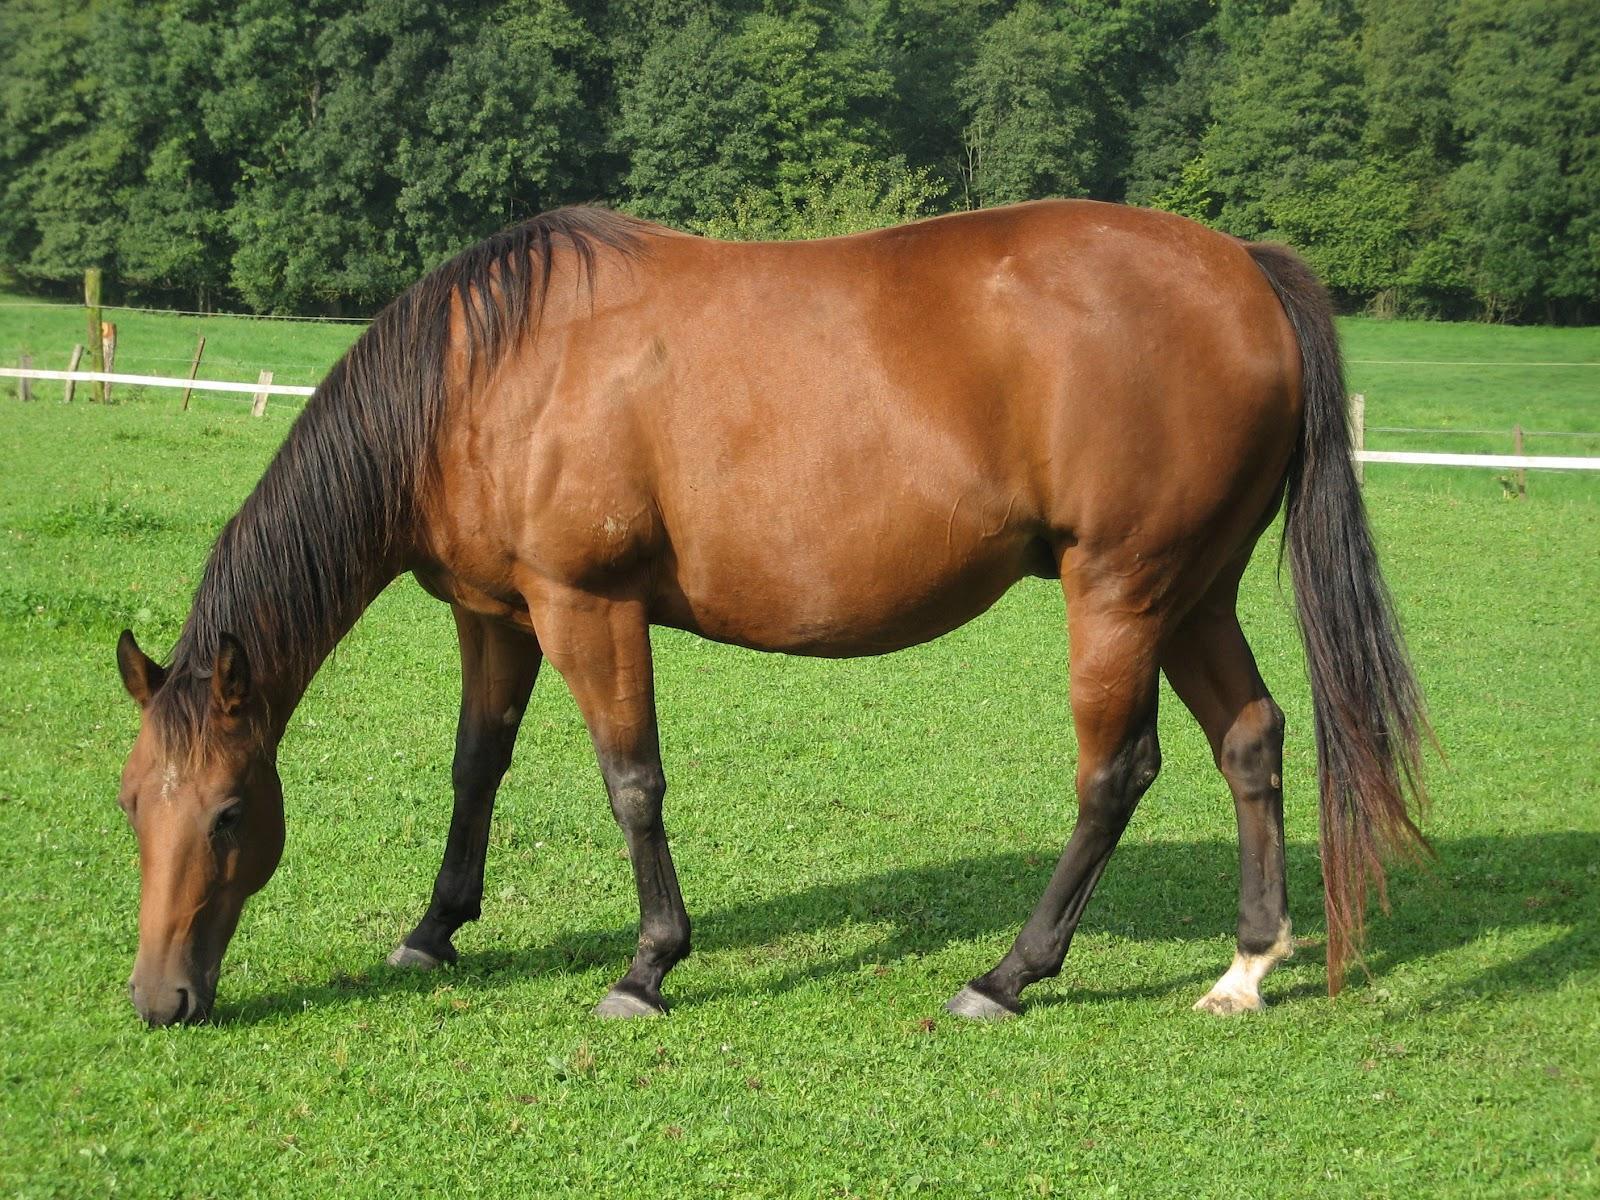 American Quarter Horse wallpapers HD